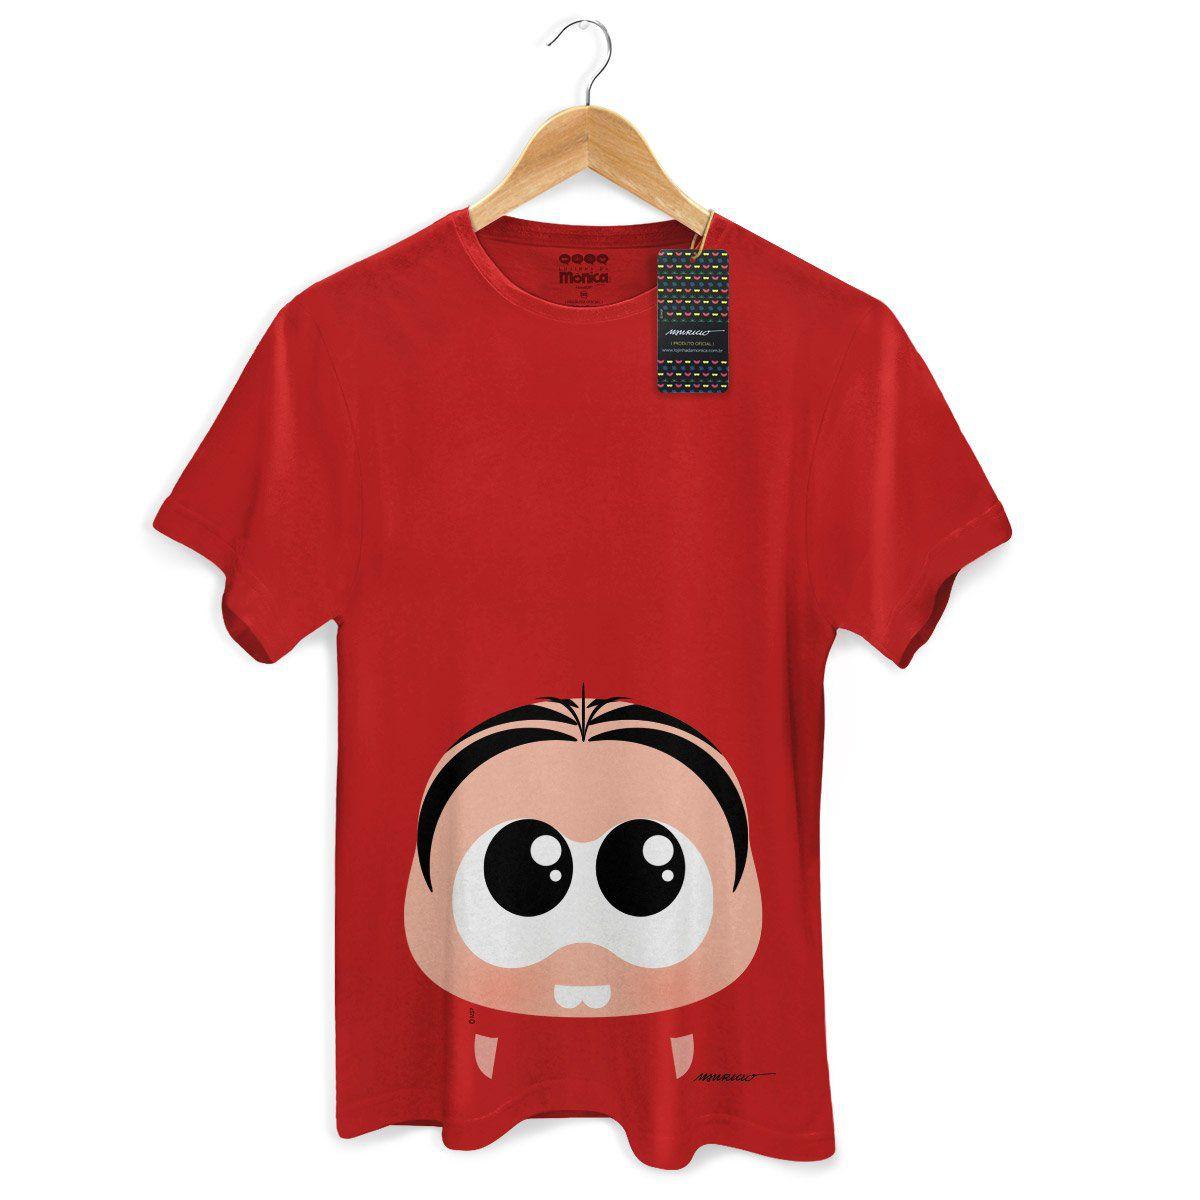 NÃO USAR Camiseta Masculina Turma da Mônica Toy Big Mônica